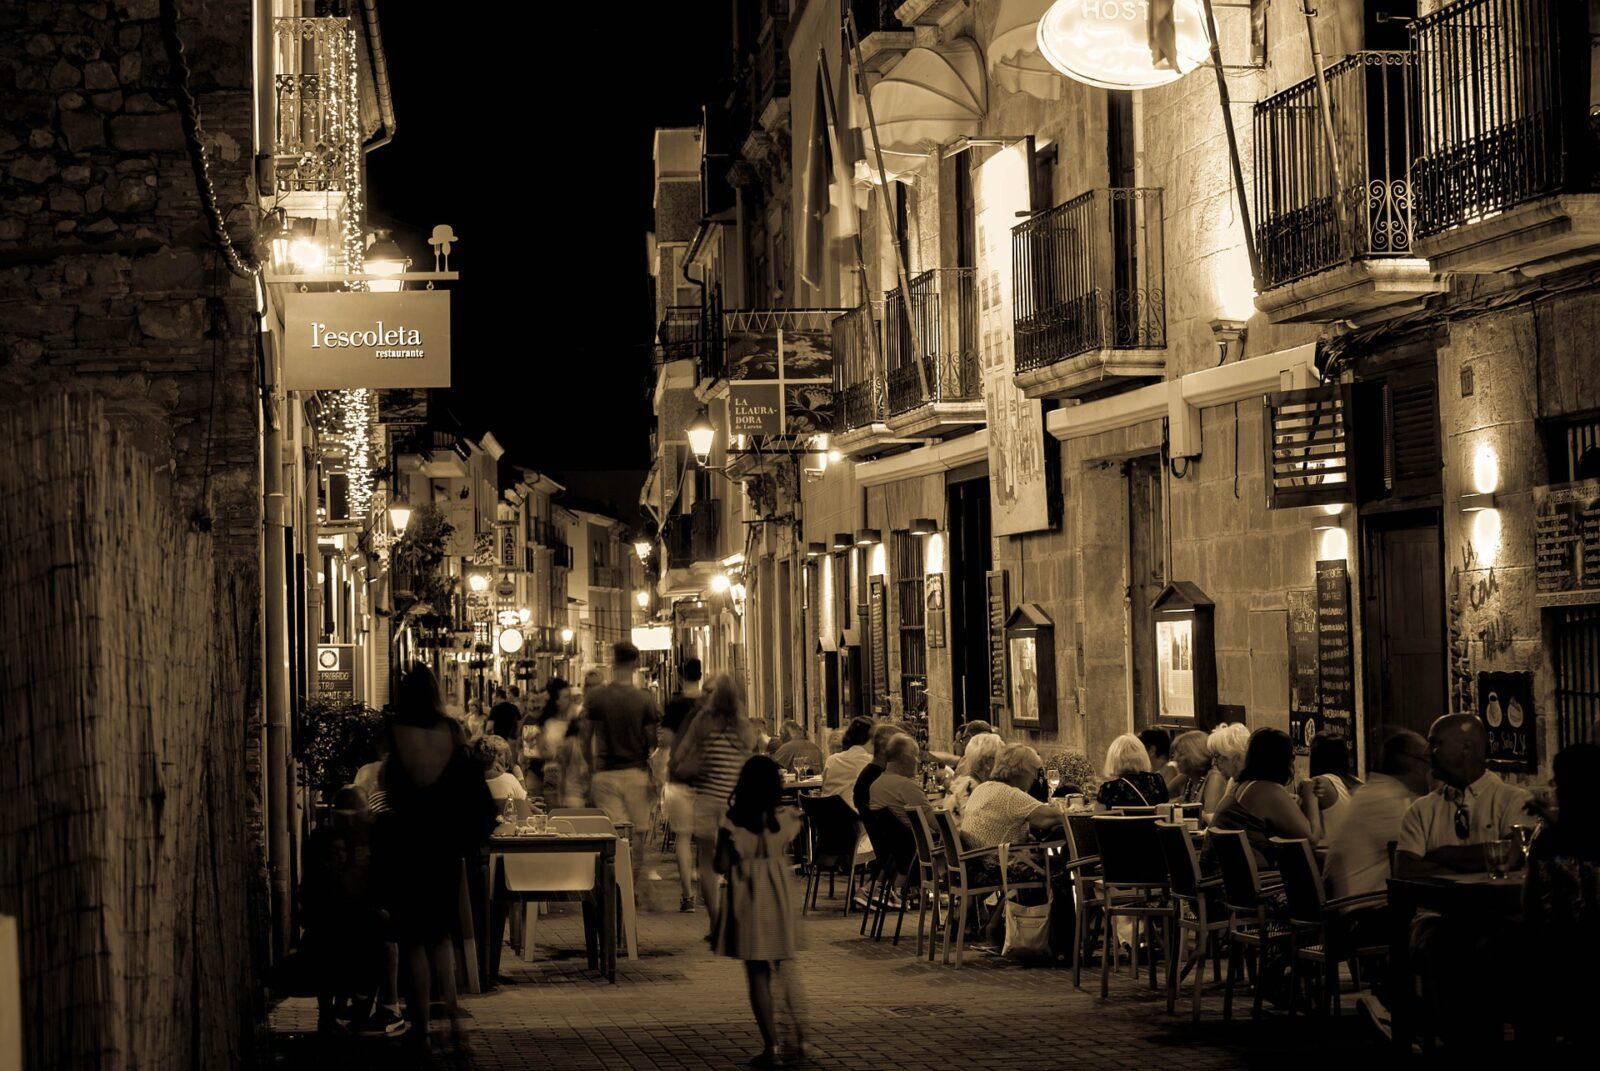 historic center denia spain at night